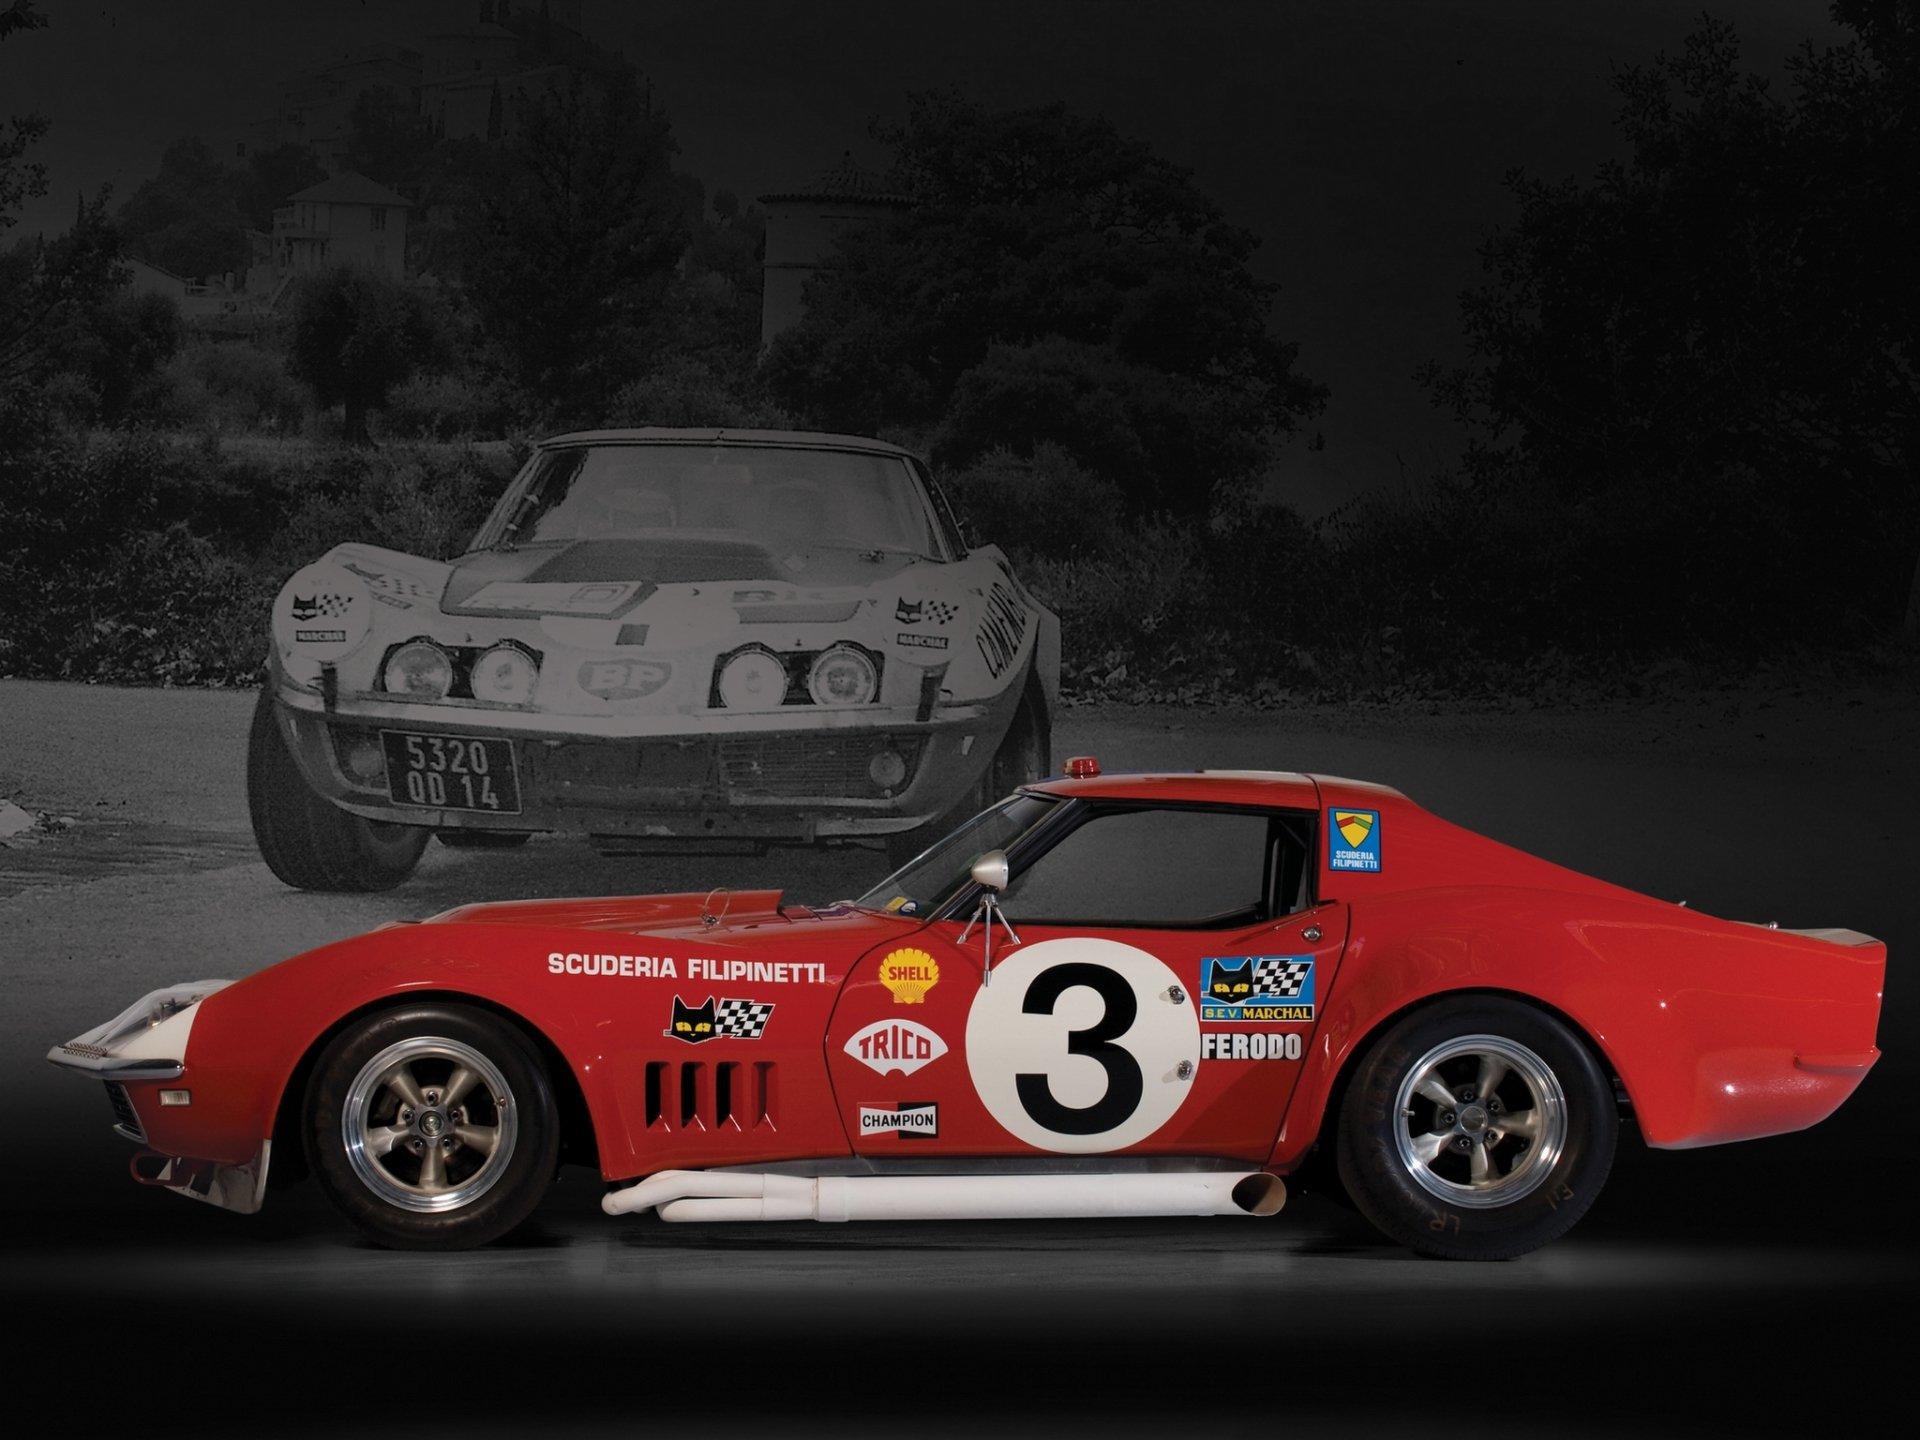 wallpaper racing car office - photo #48